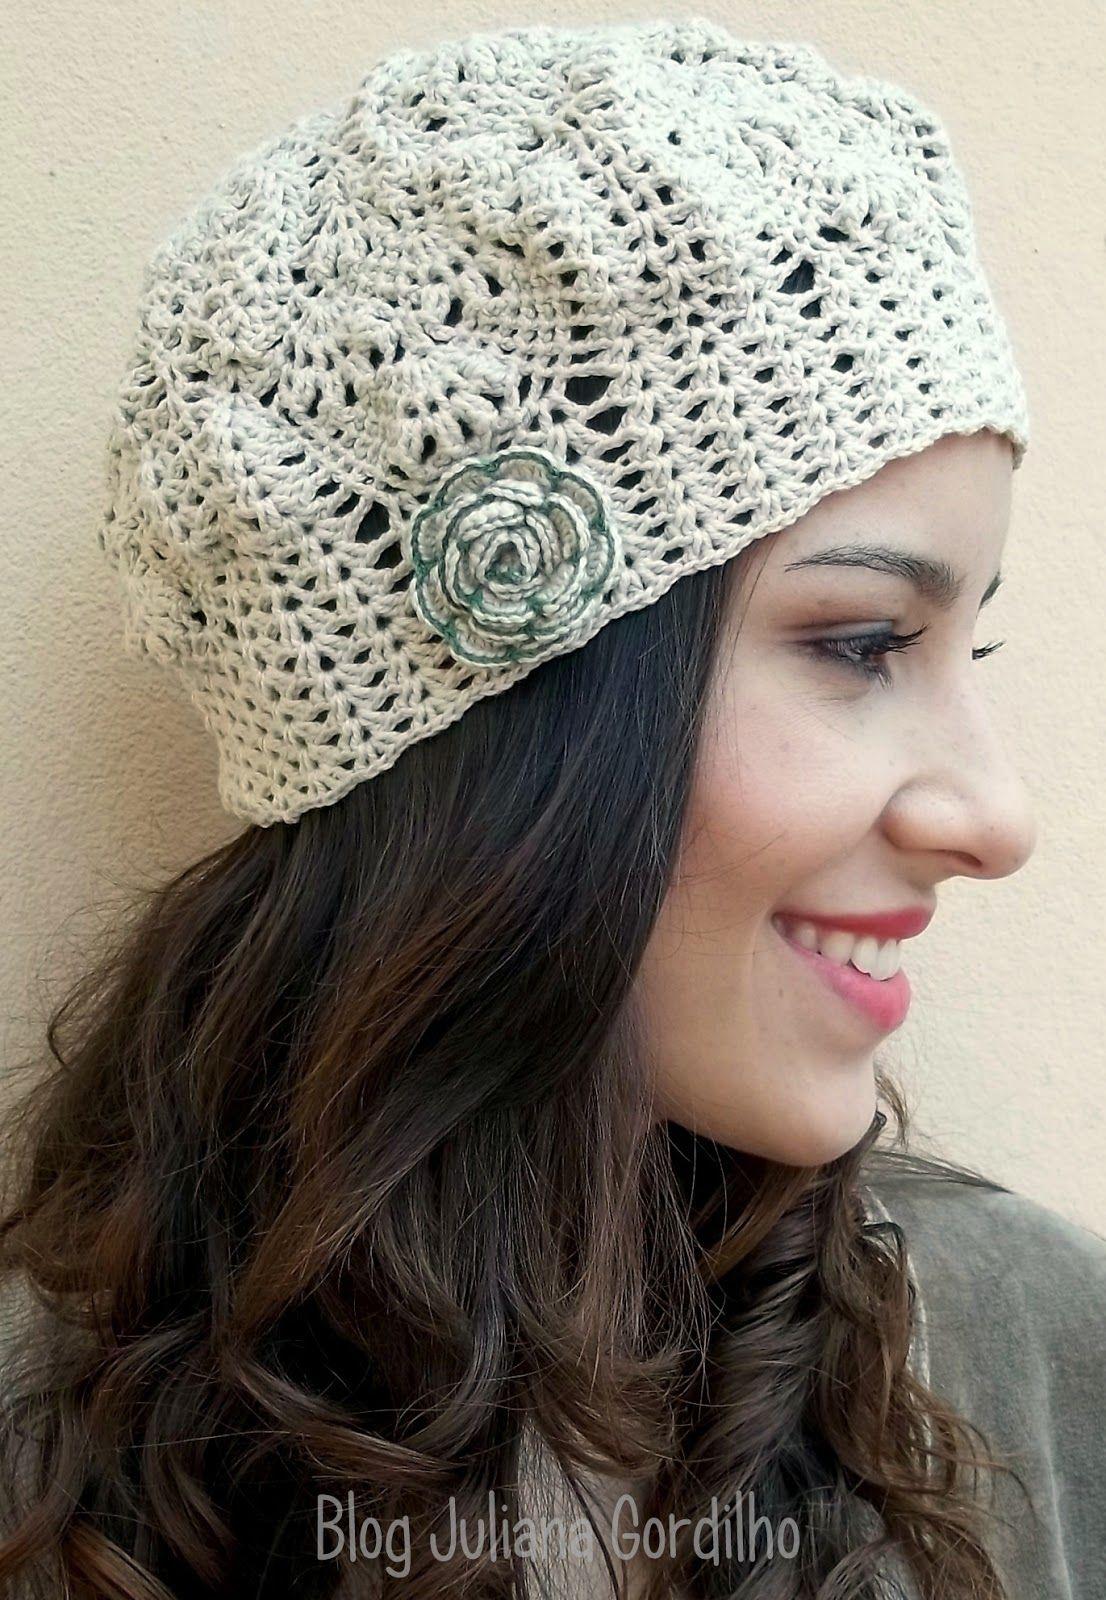 Blog Juliana Gordilho: Boina artesanal | boina e touca croche ou ...